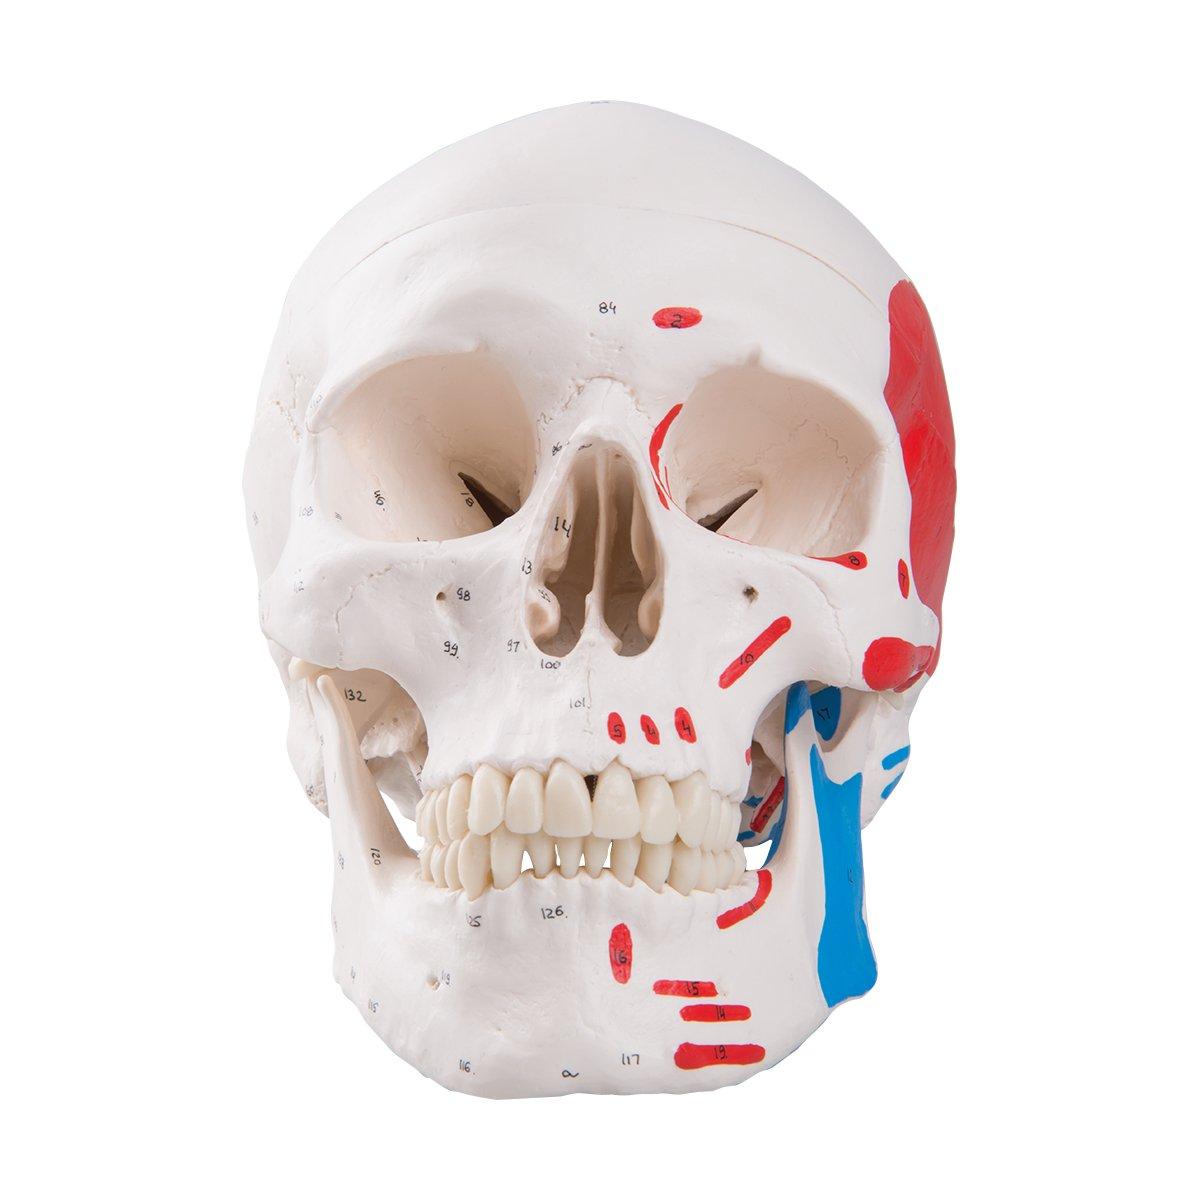 頭蓋,筋番号表示付,3分解モデル   B006YWWIAS